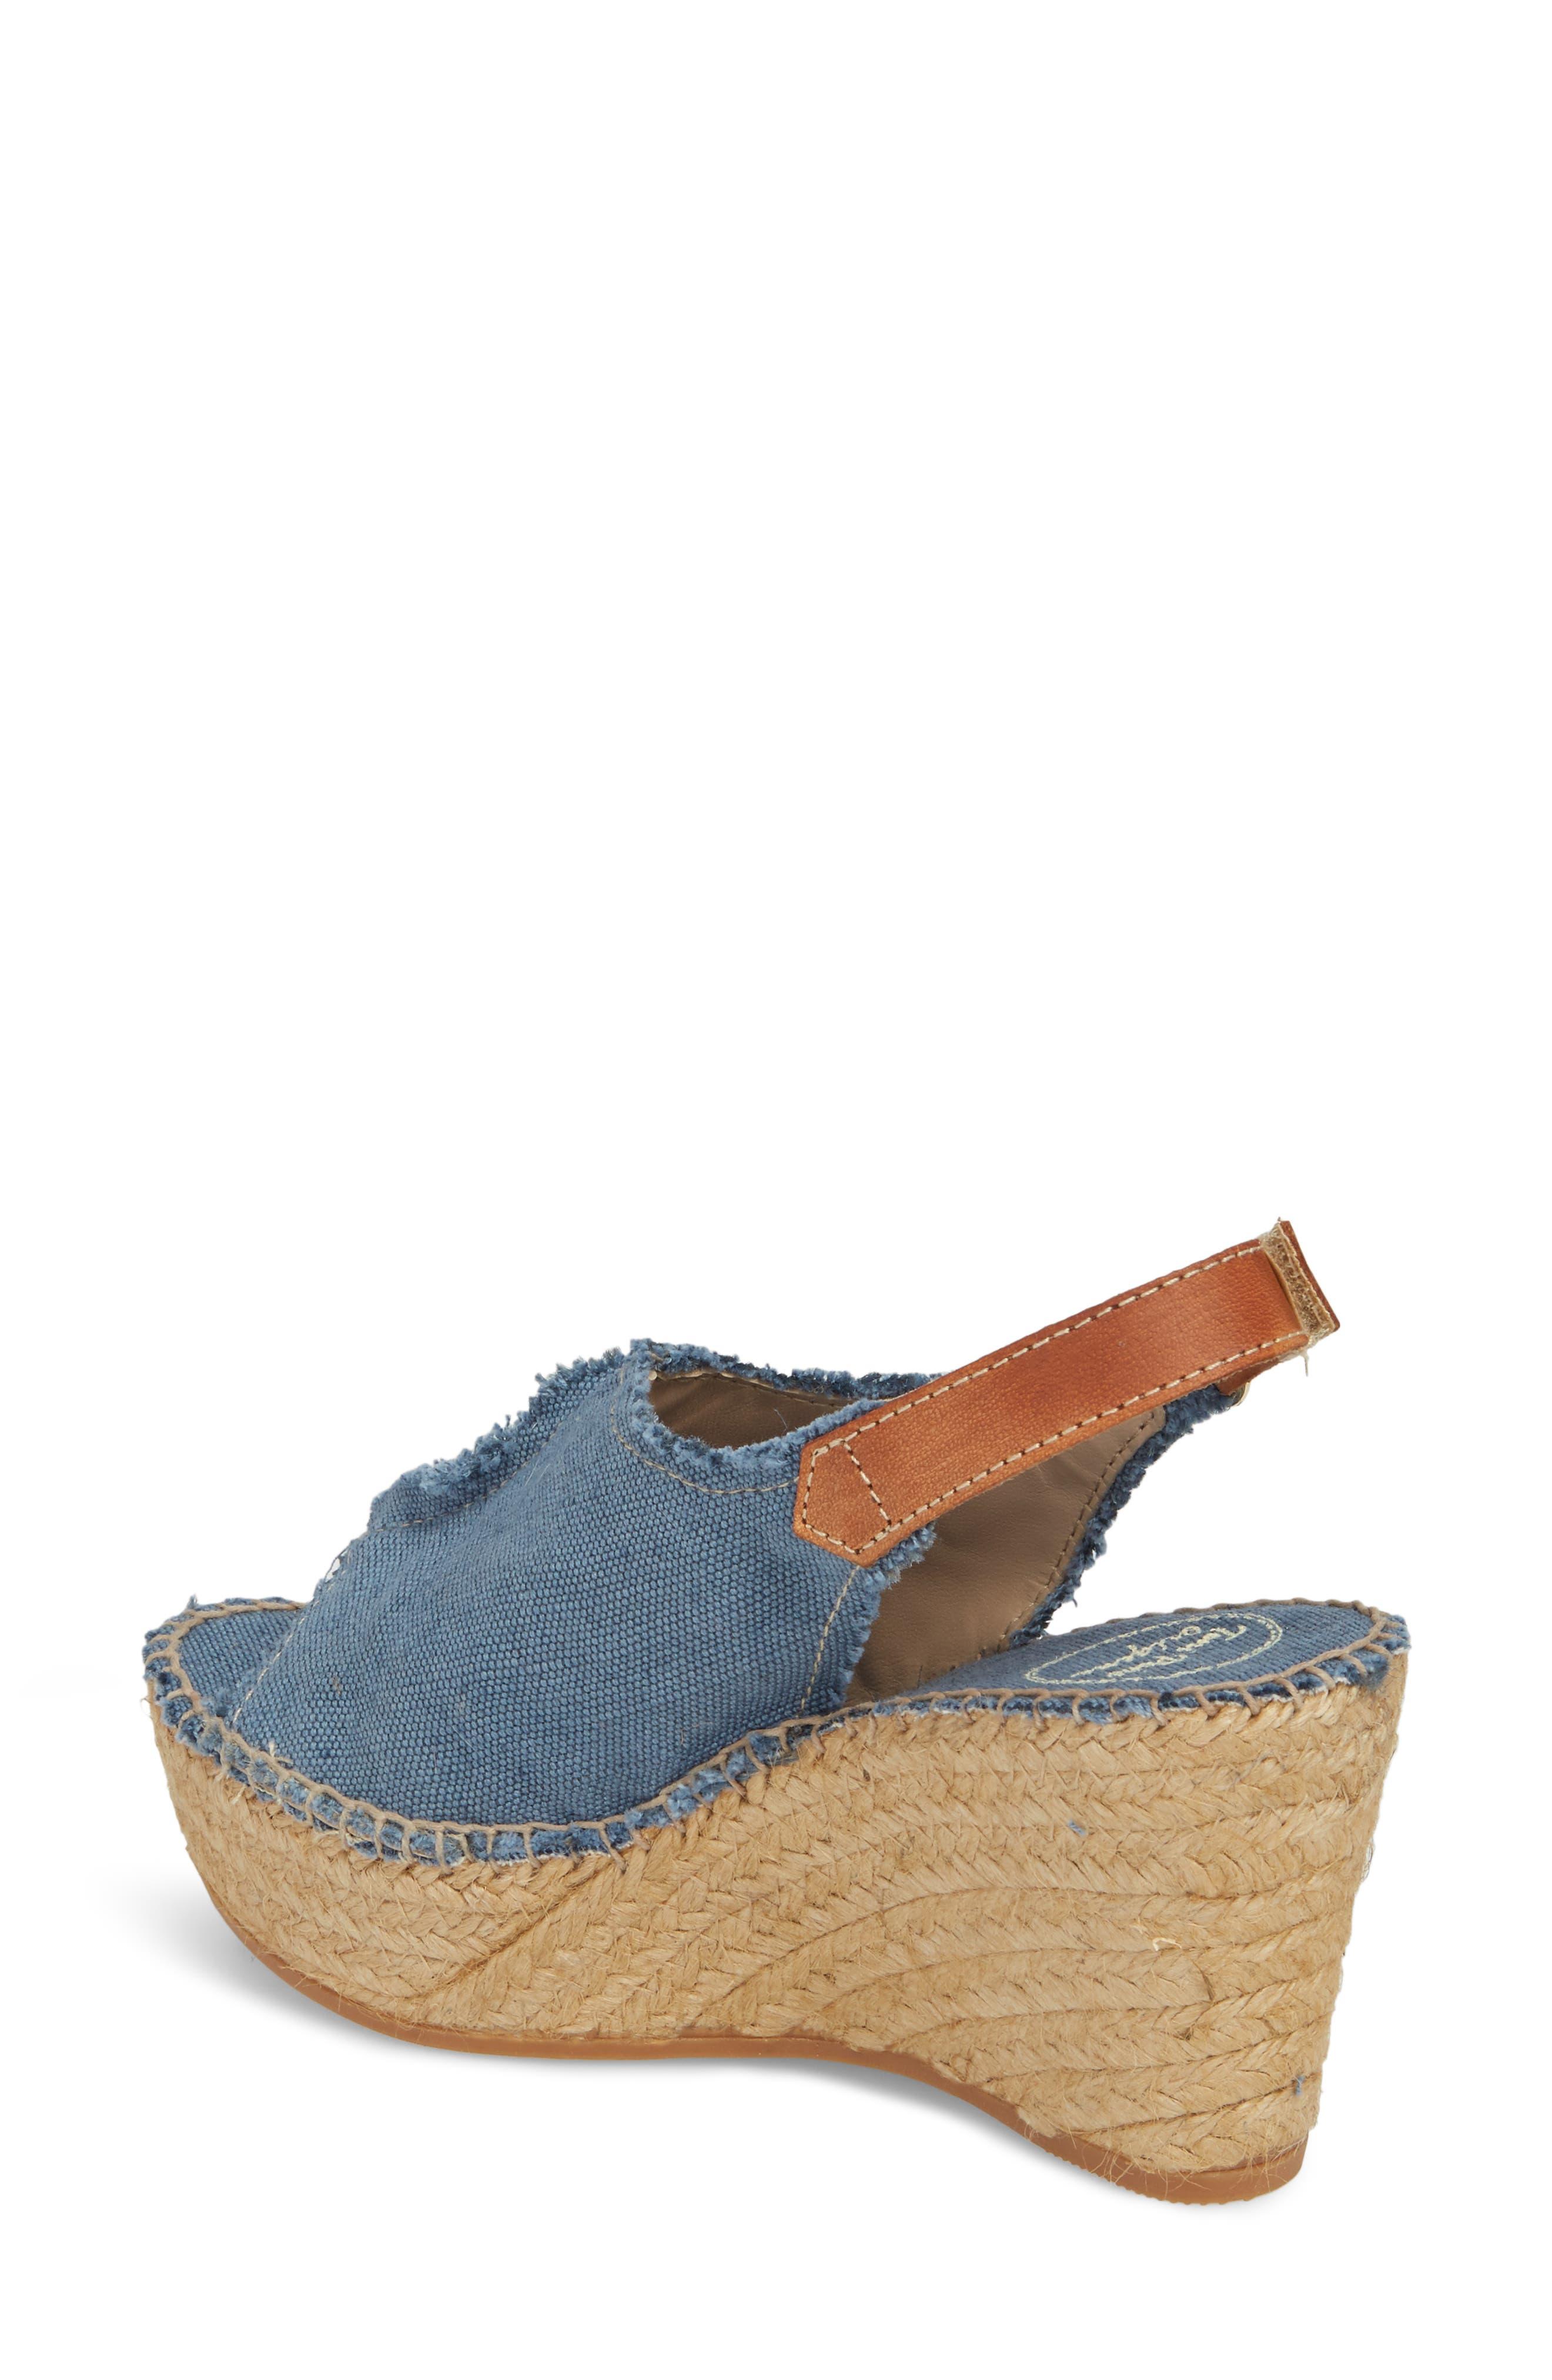 'Lugano' Espadrille Wedge Sandal,                             Alternate thumbnail 2, color,                             Blue Fabric